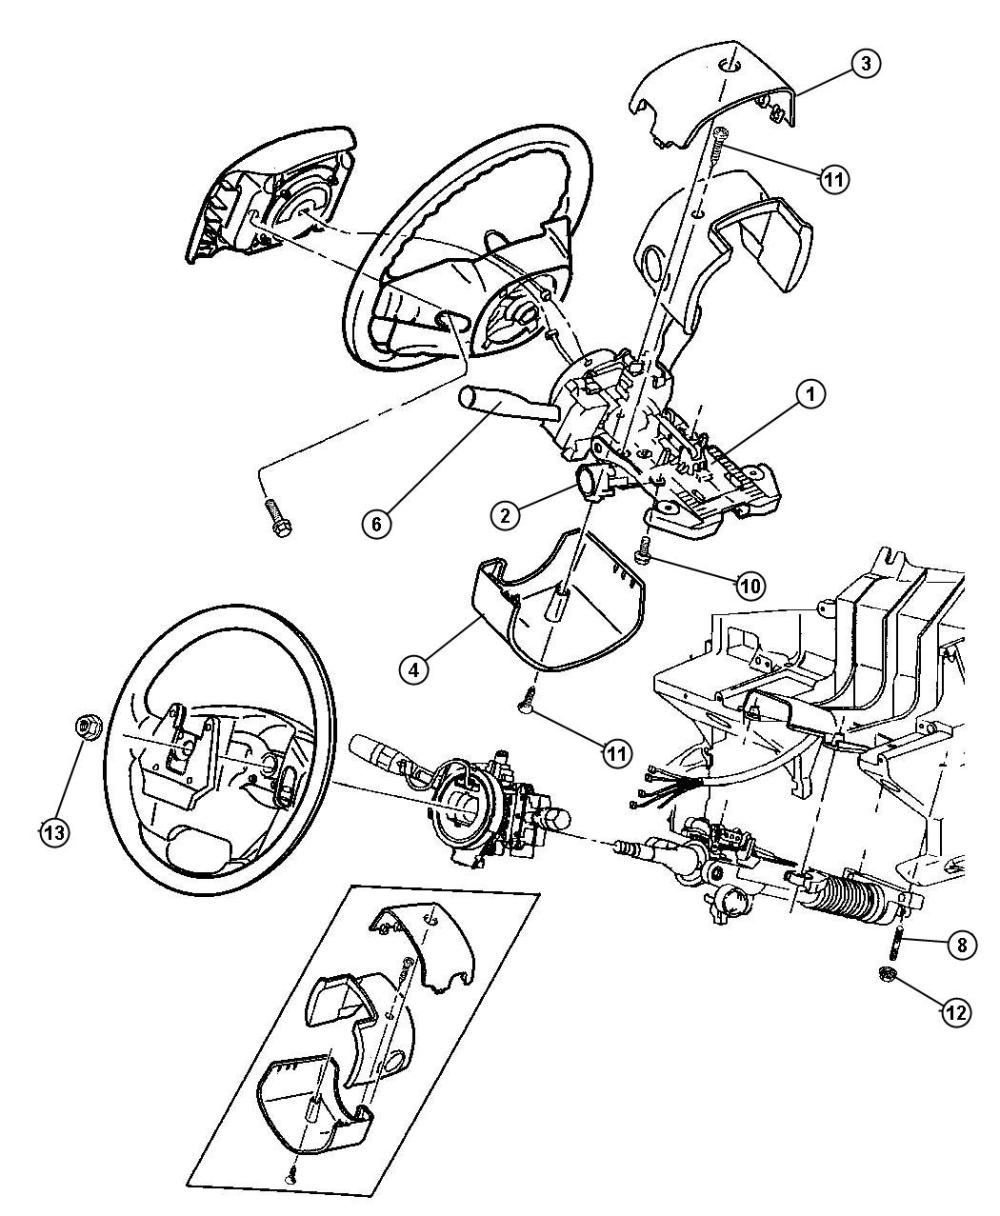 medium resolution of pontiac g8 transmission diagram pontiac free engine 2006 pontiac g8 2008 pontiac g6